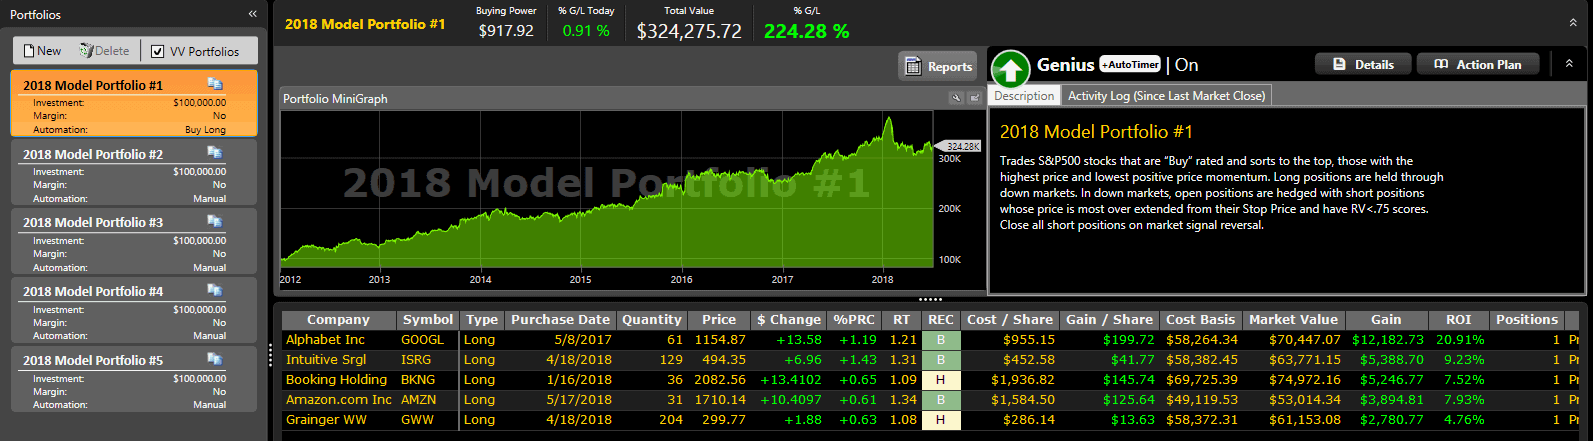 vectorvest-model-portfolio